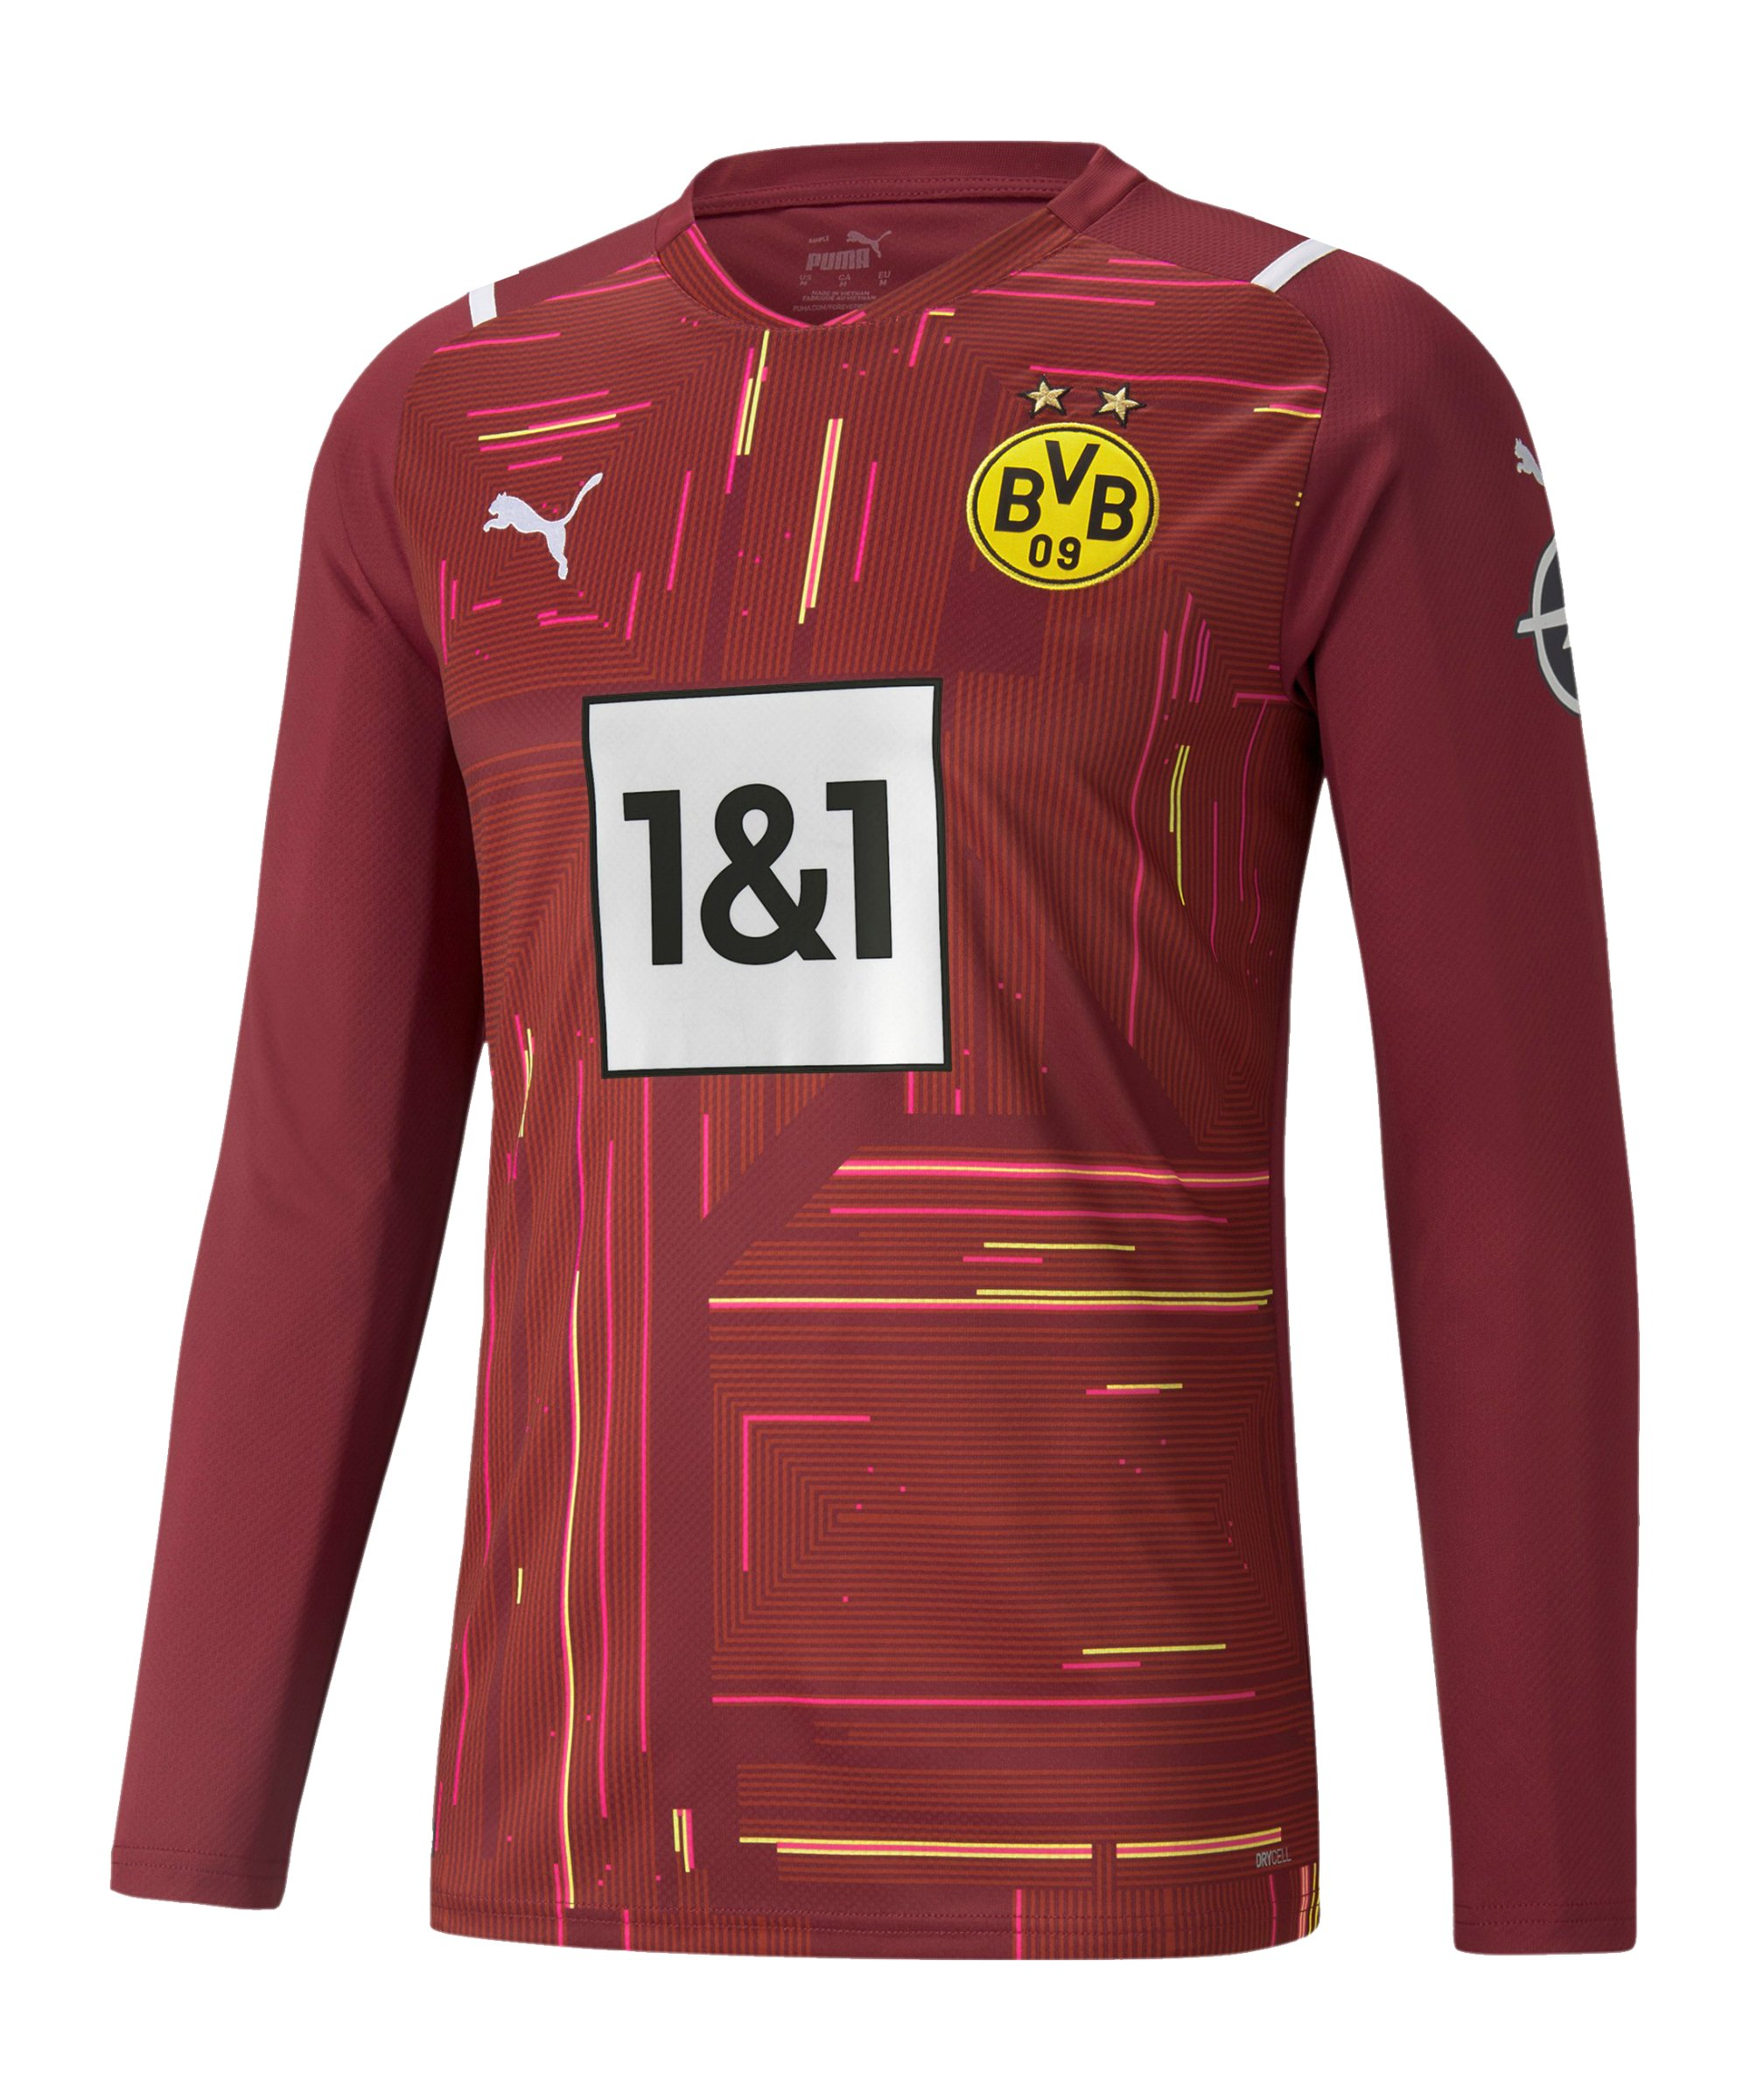 PUMA BVB Dortmund Torwarttrikot 2021/2022 Rot F48 - rot